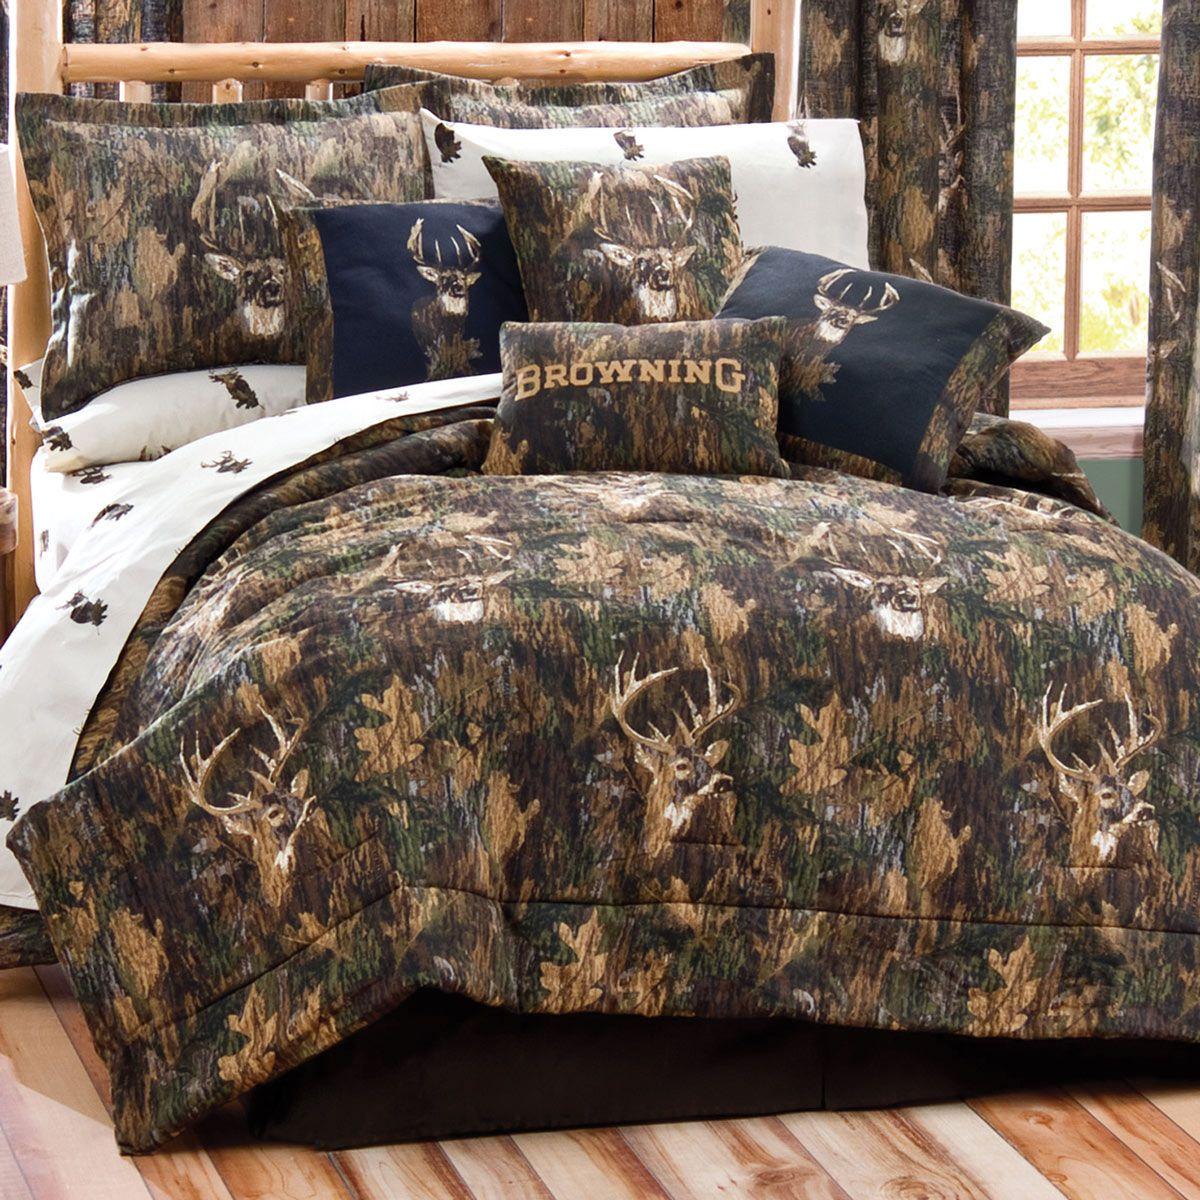 Browning Camo Deer Comforter Set Twin Home Decor Camo